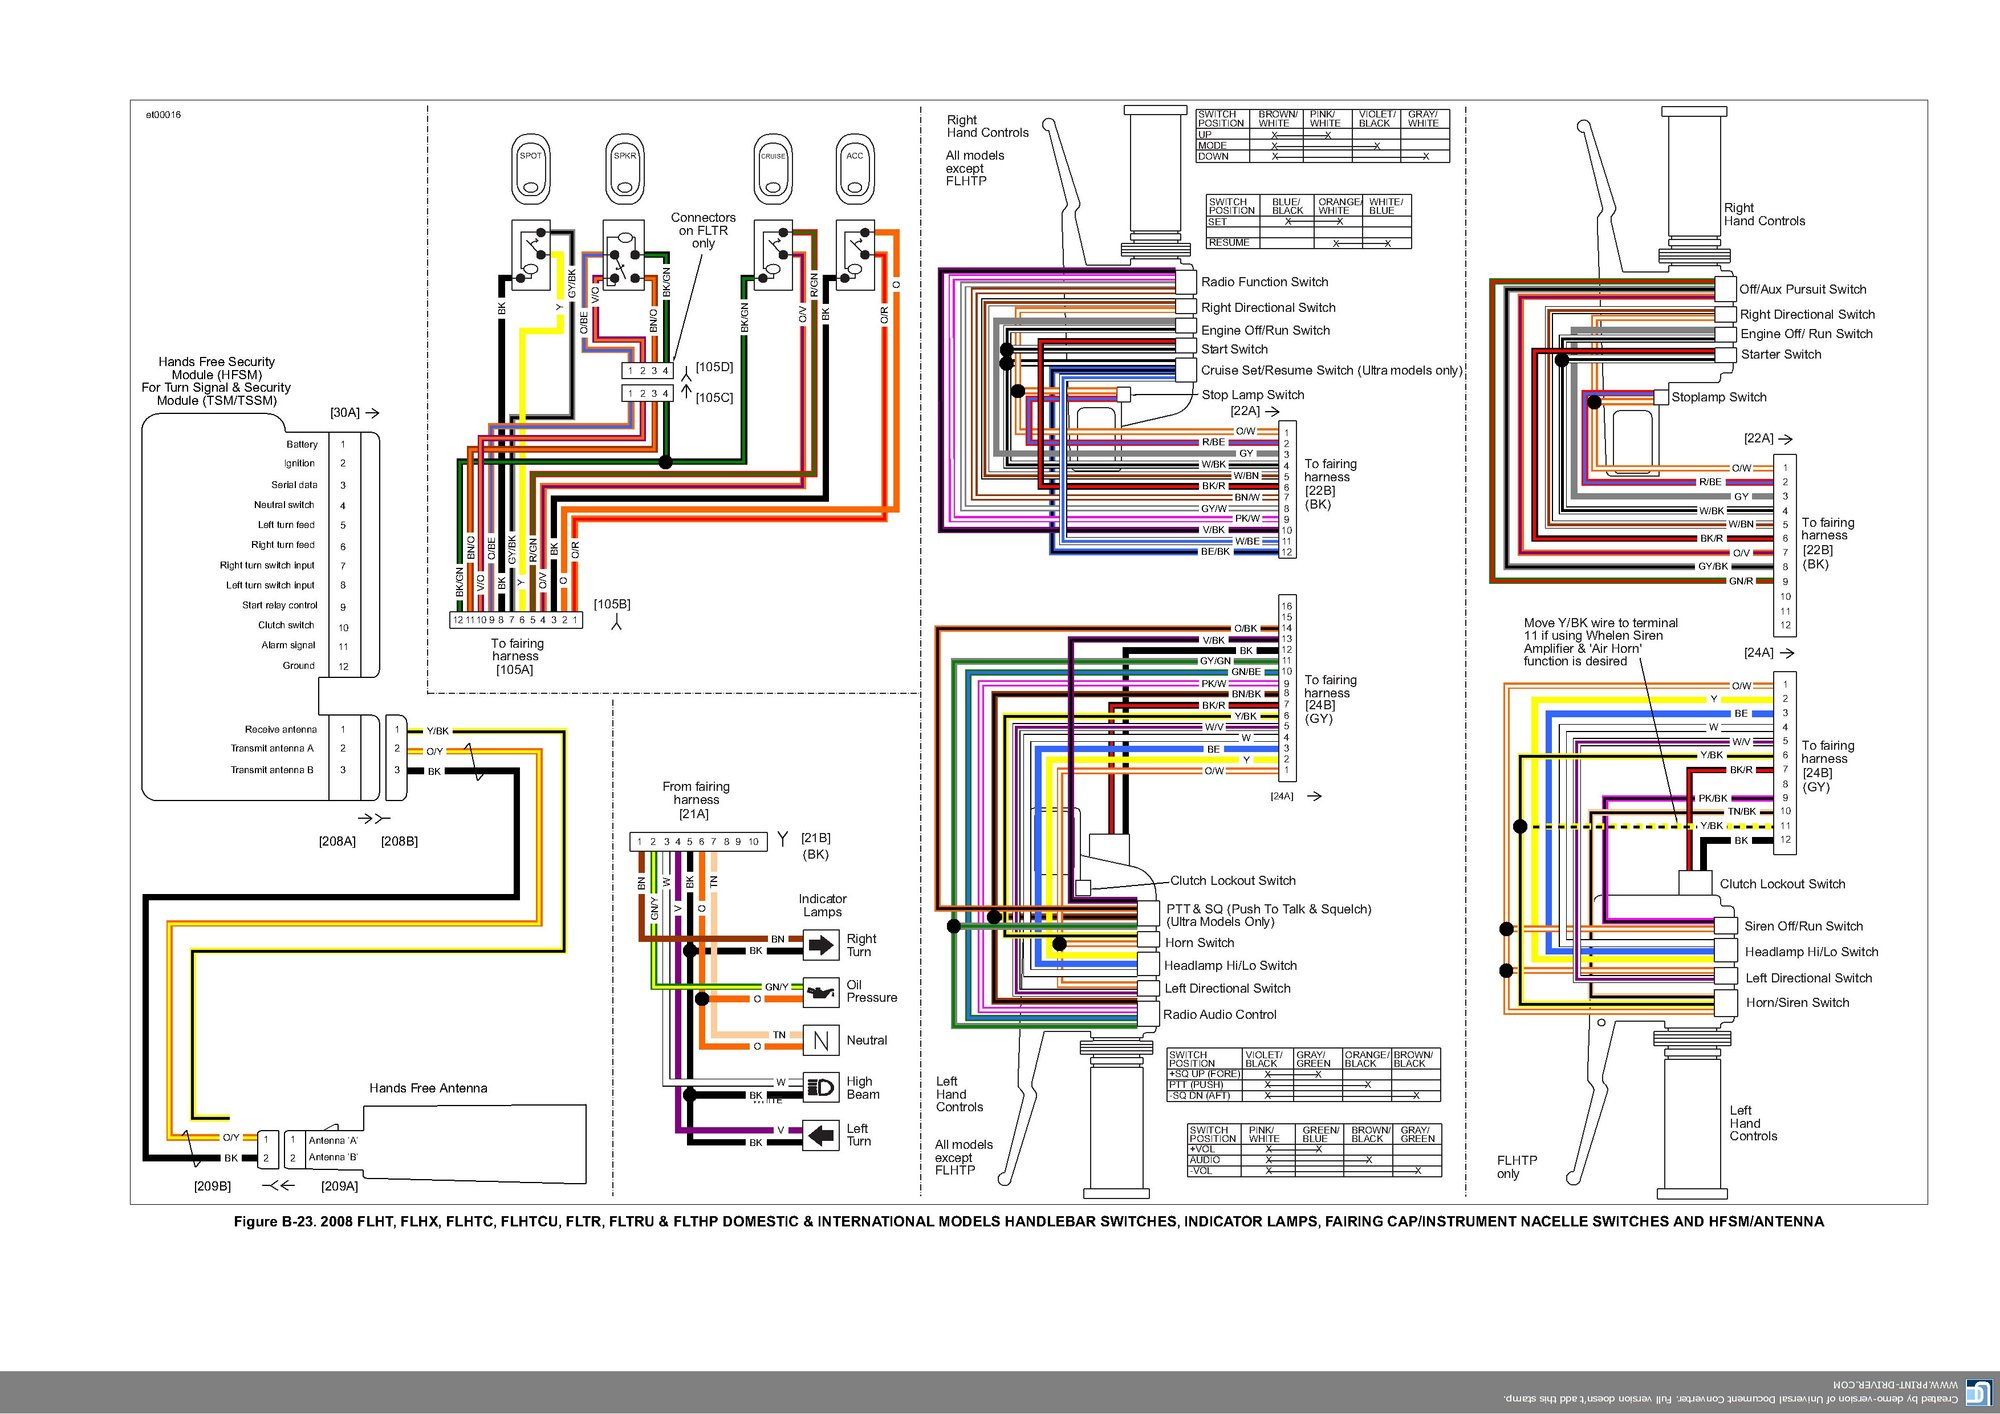 DB_8597] 2007 Flht Wiring Diagram Ecu Download DiagramSapre Lious Anth Vira Mohammedshrine Librar Wiring 101